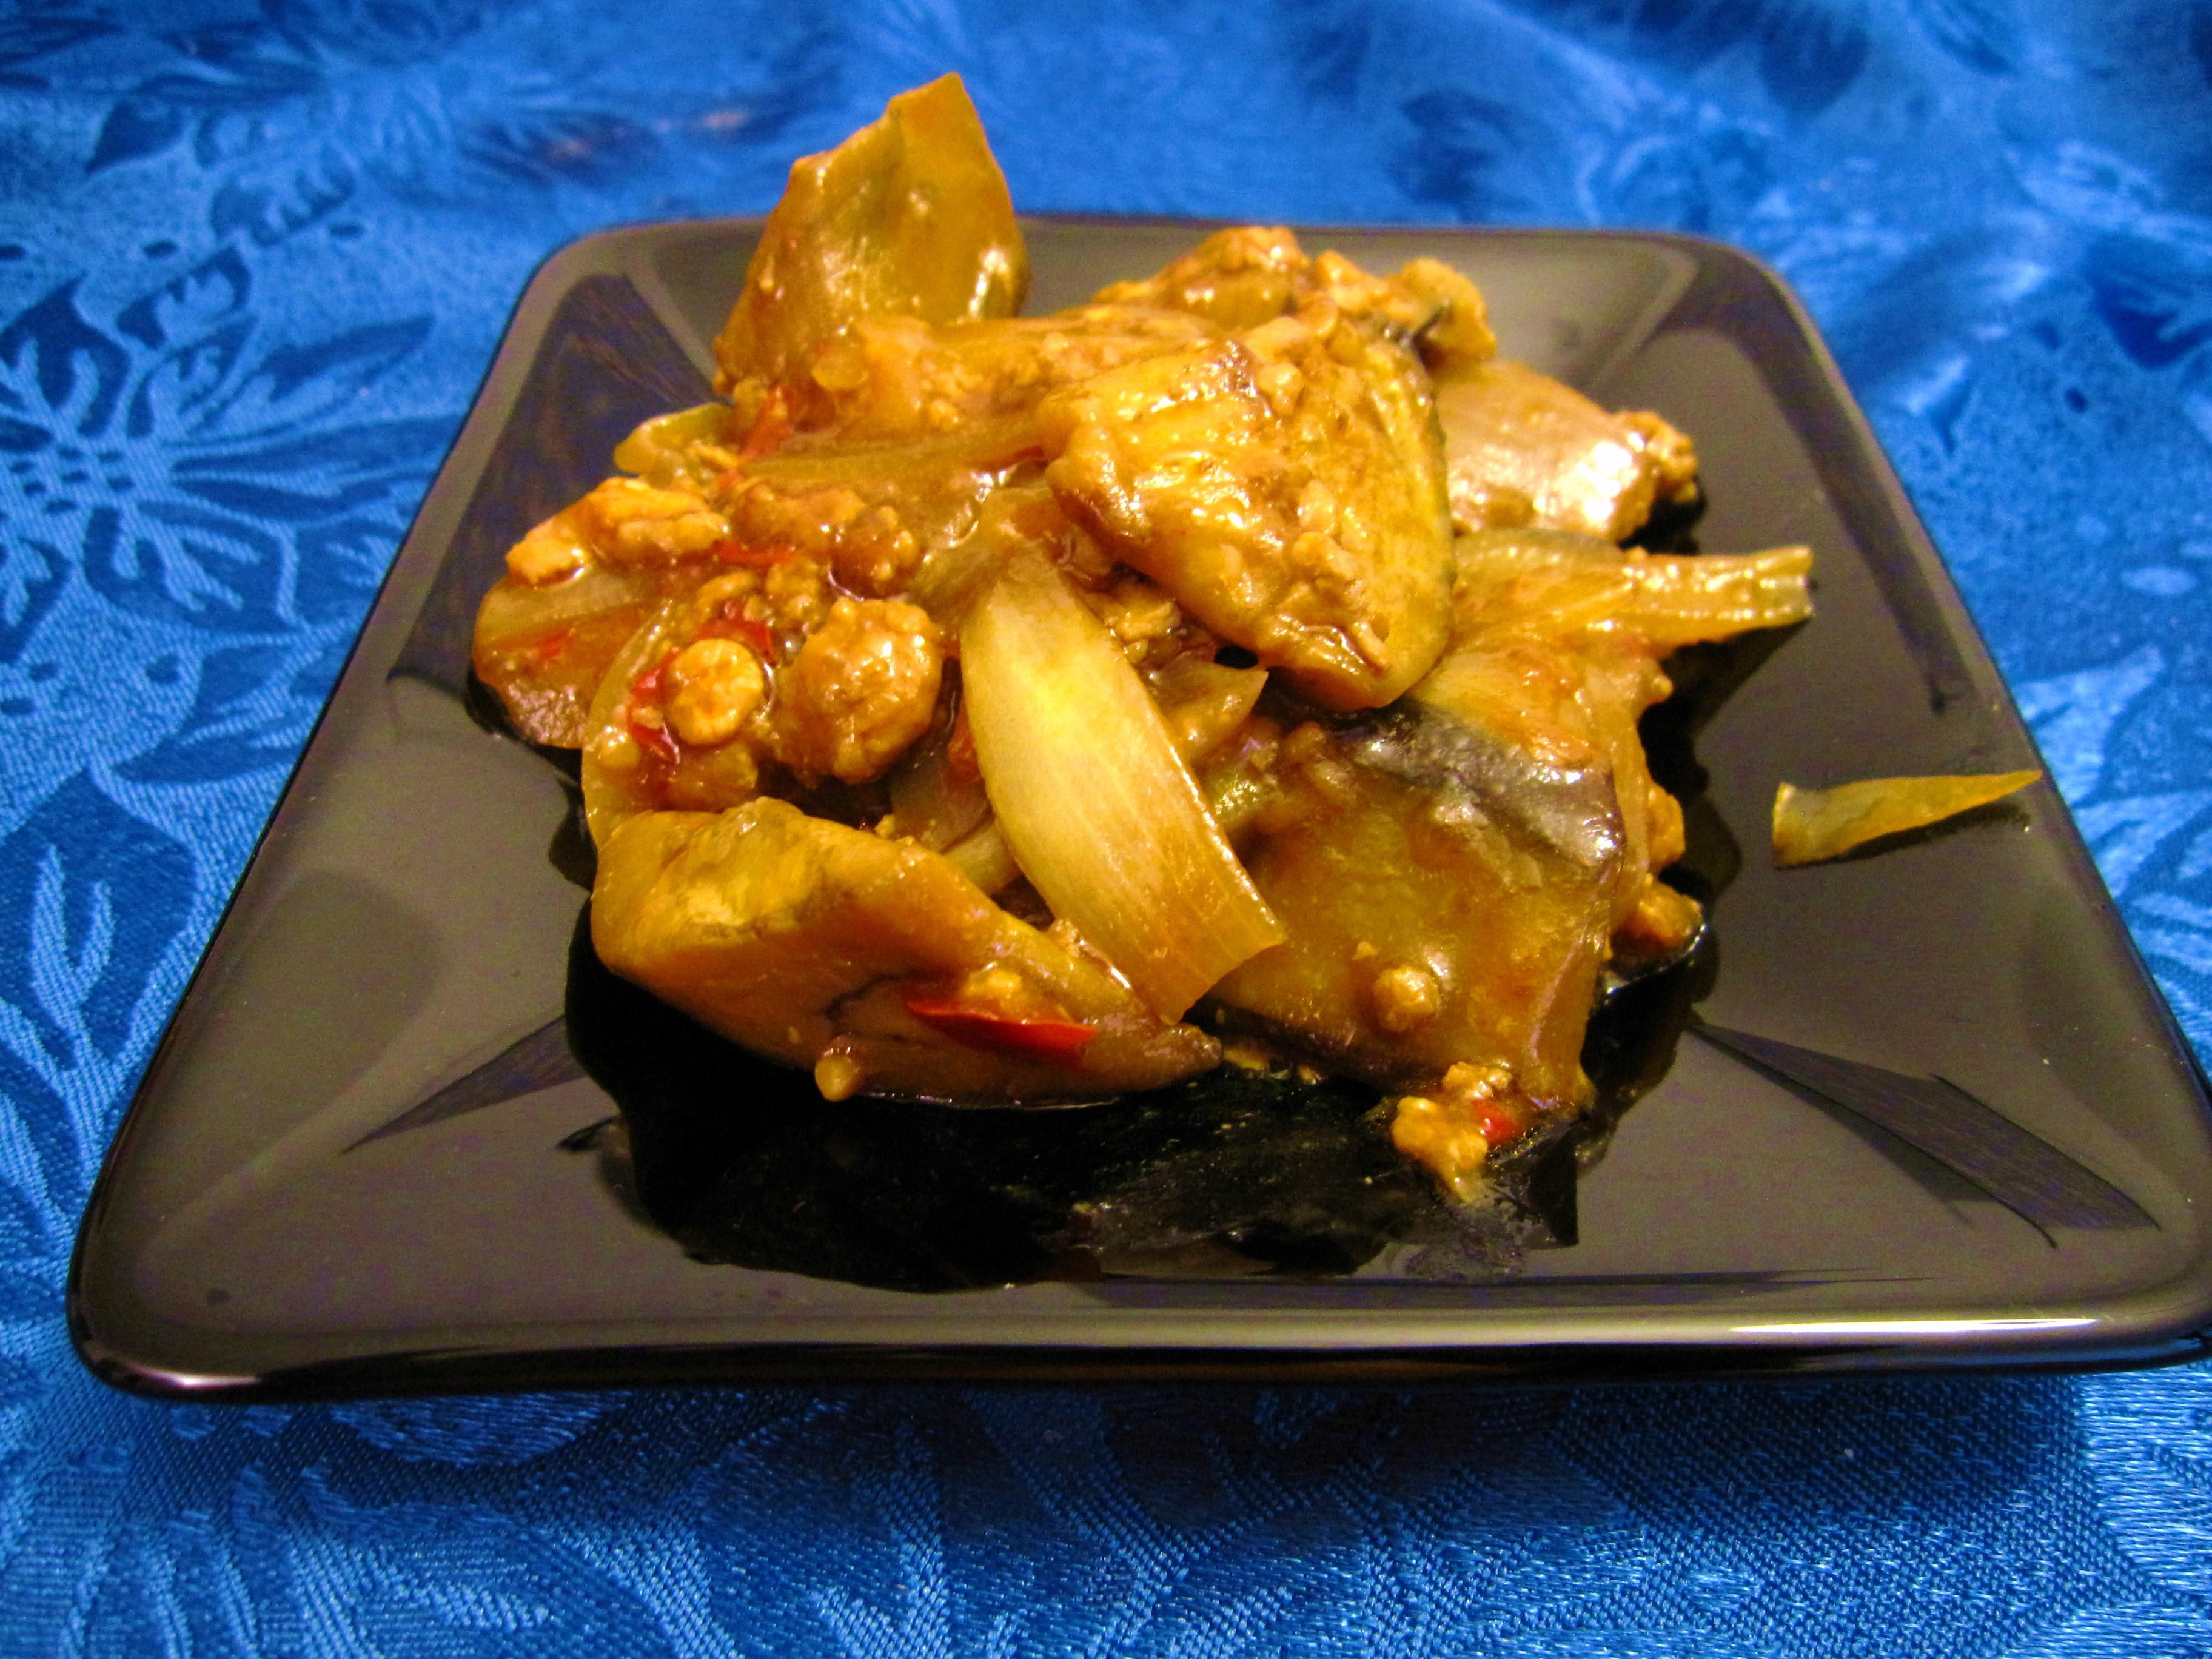 Spicy eggplant supreme